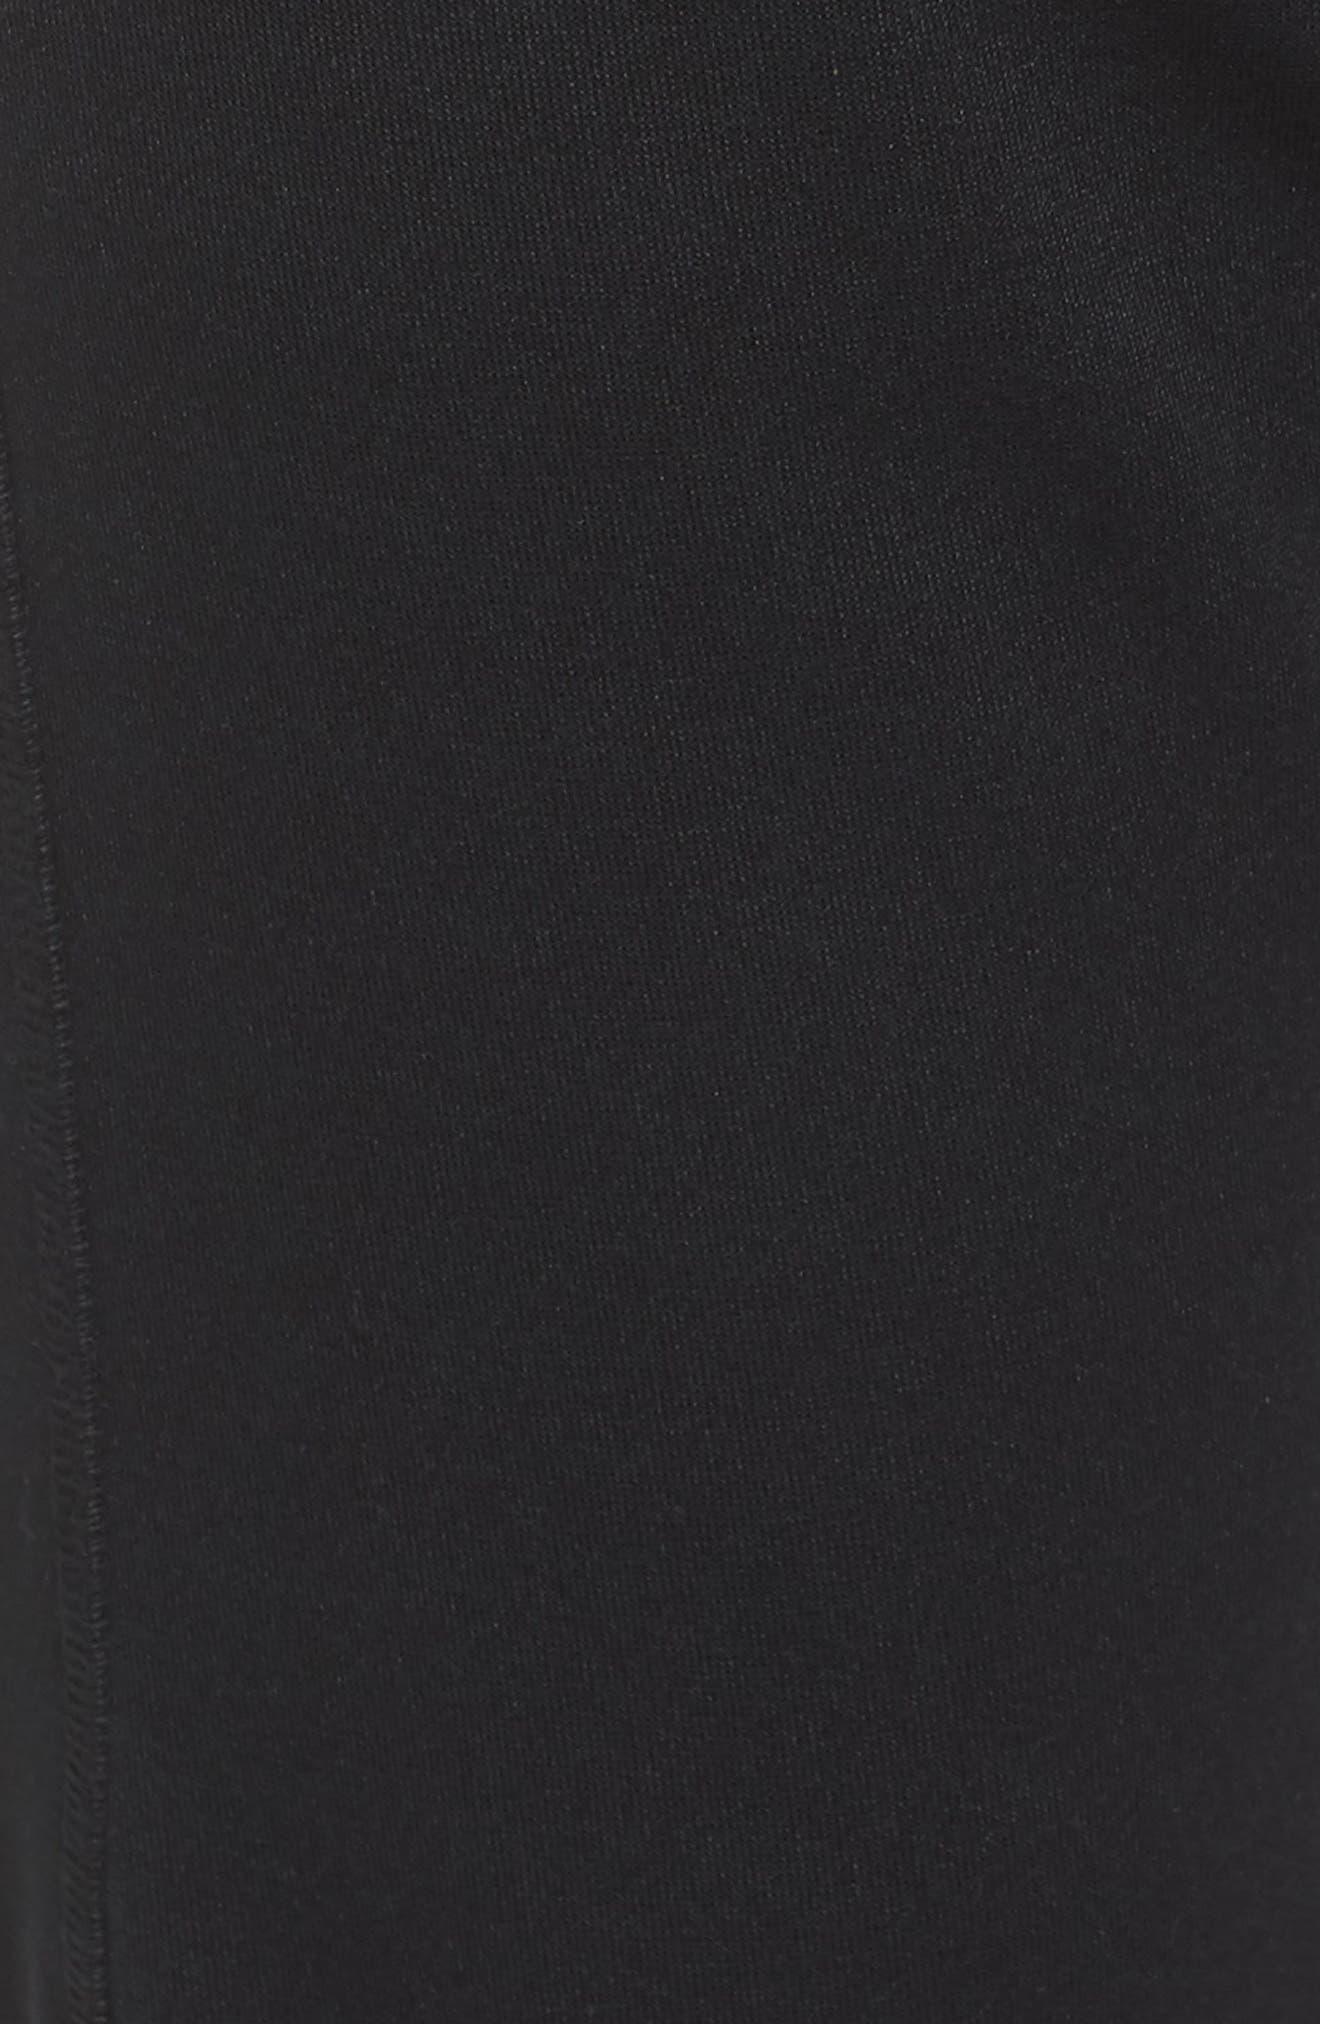 Sportswear Air Jogger Pants,                             Alternate thumbnail 6, color,                             010